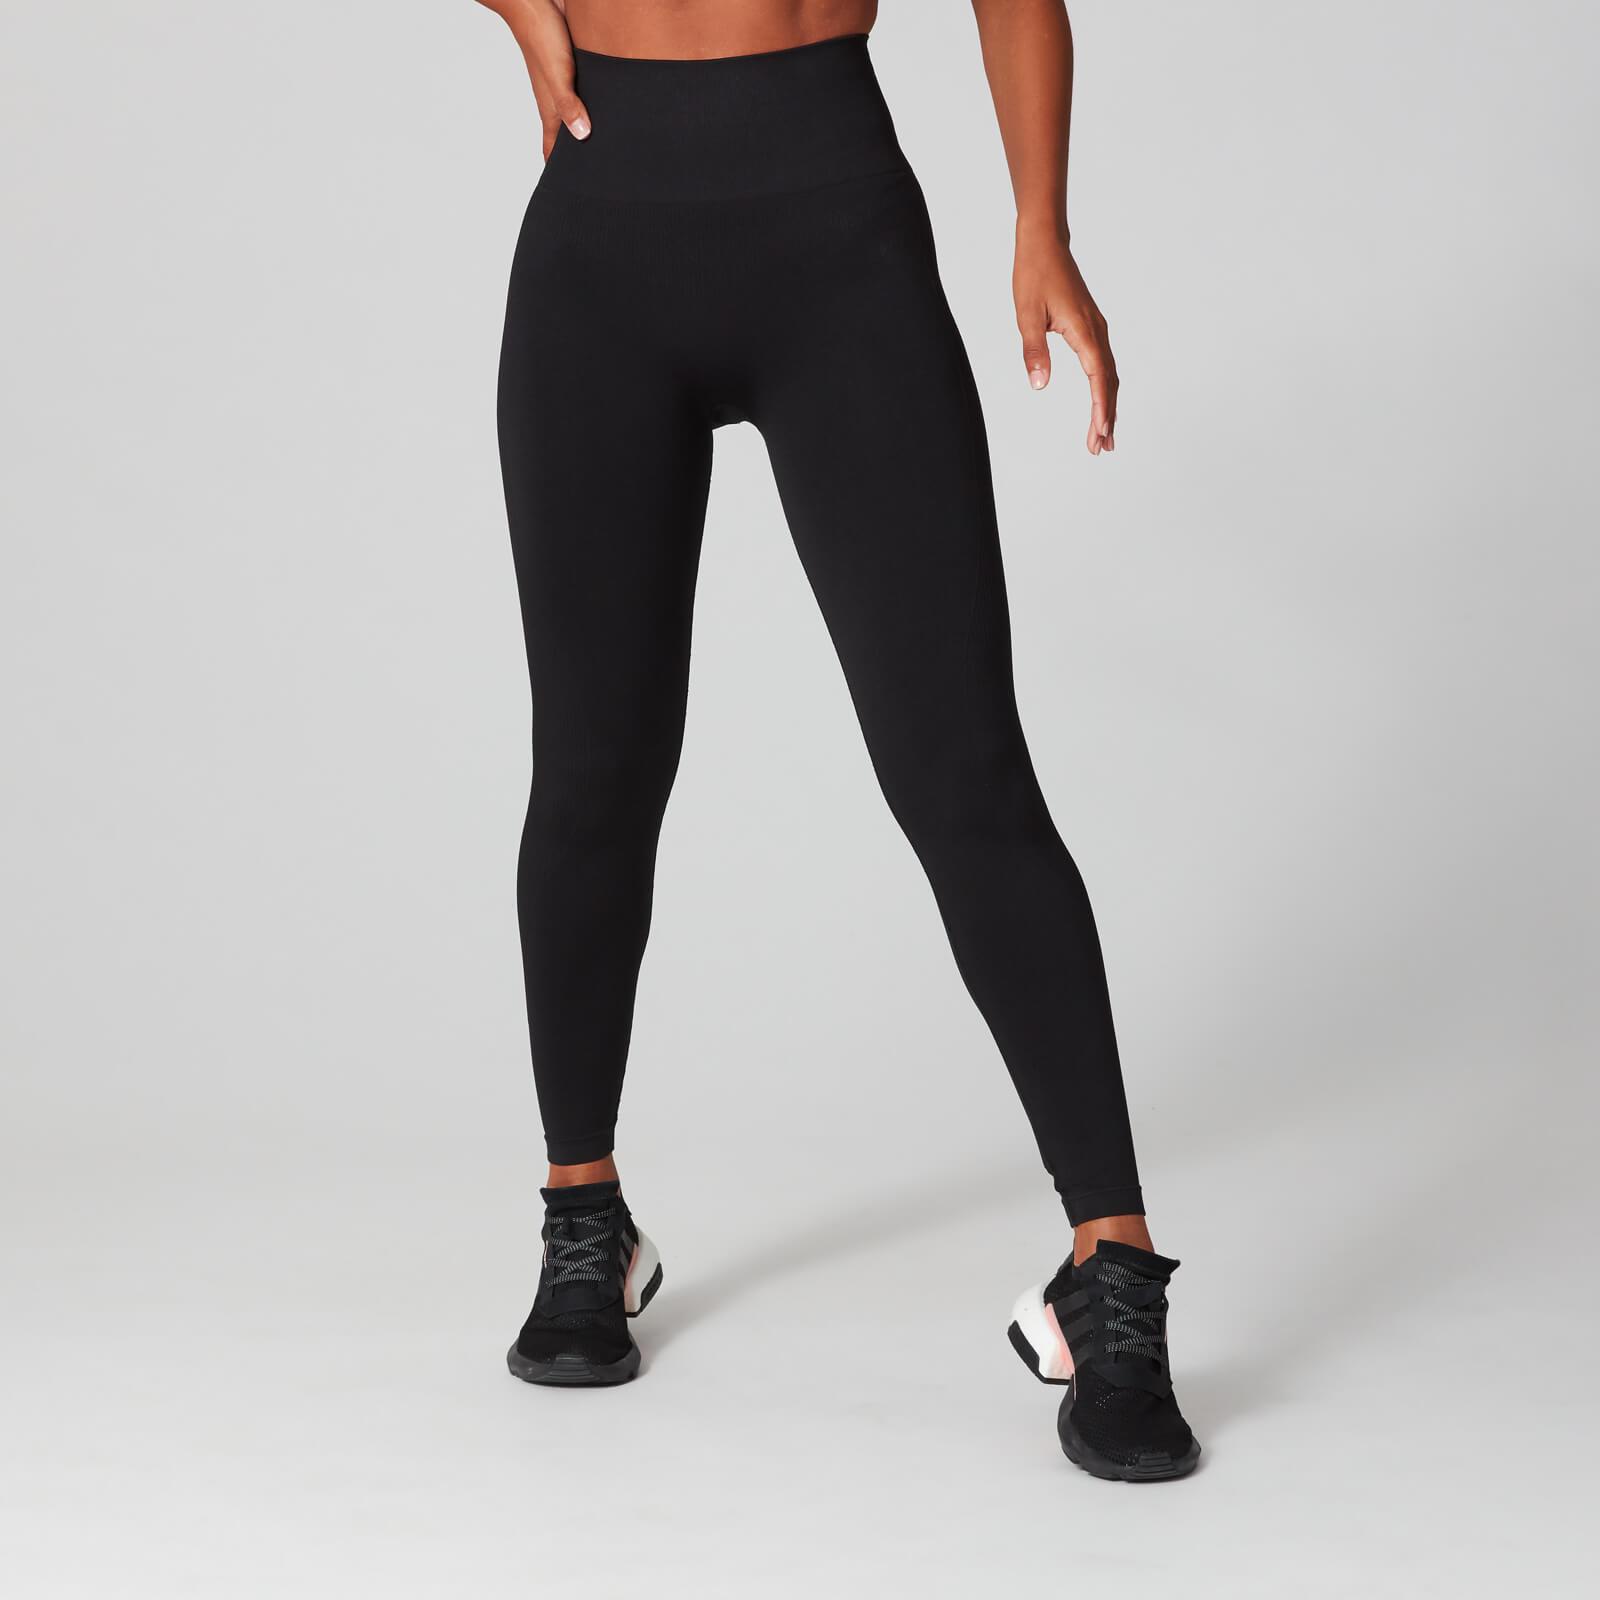 Large Logo Tights Black Womens   Sports leggings, Black